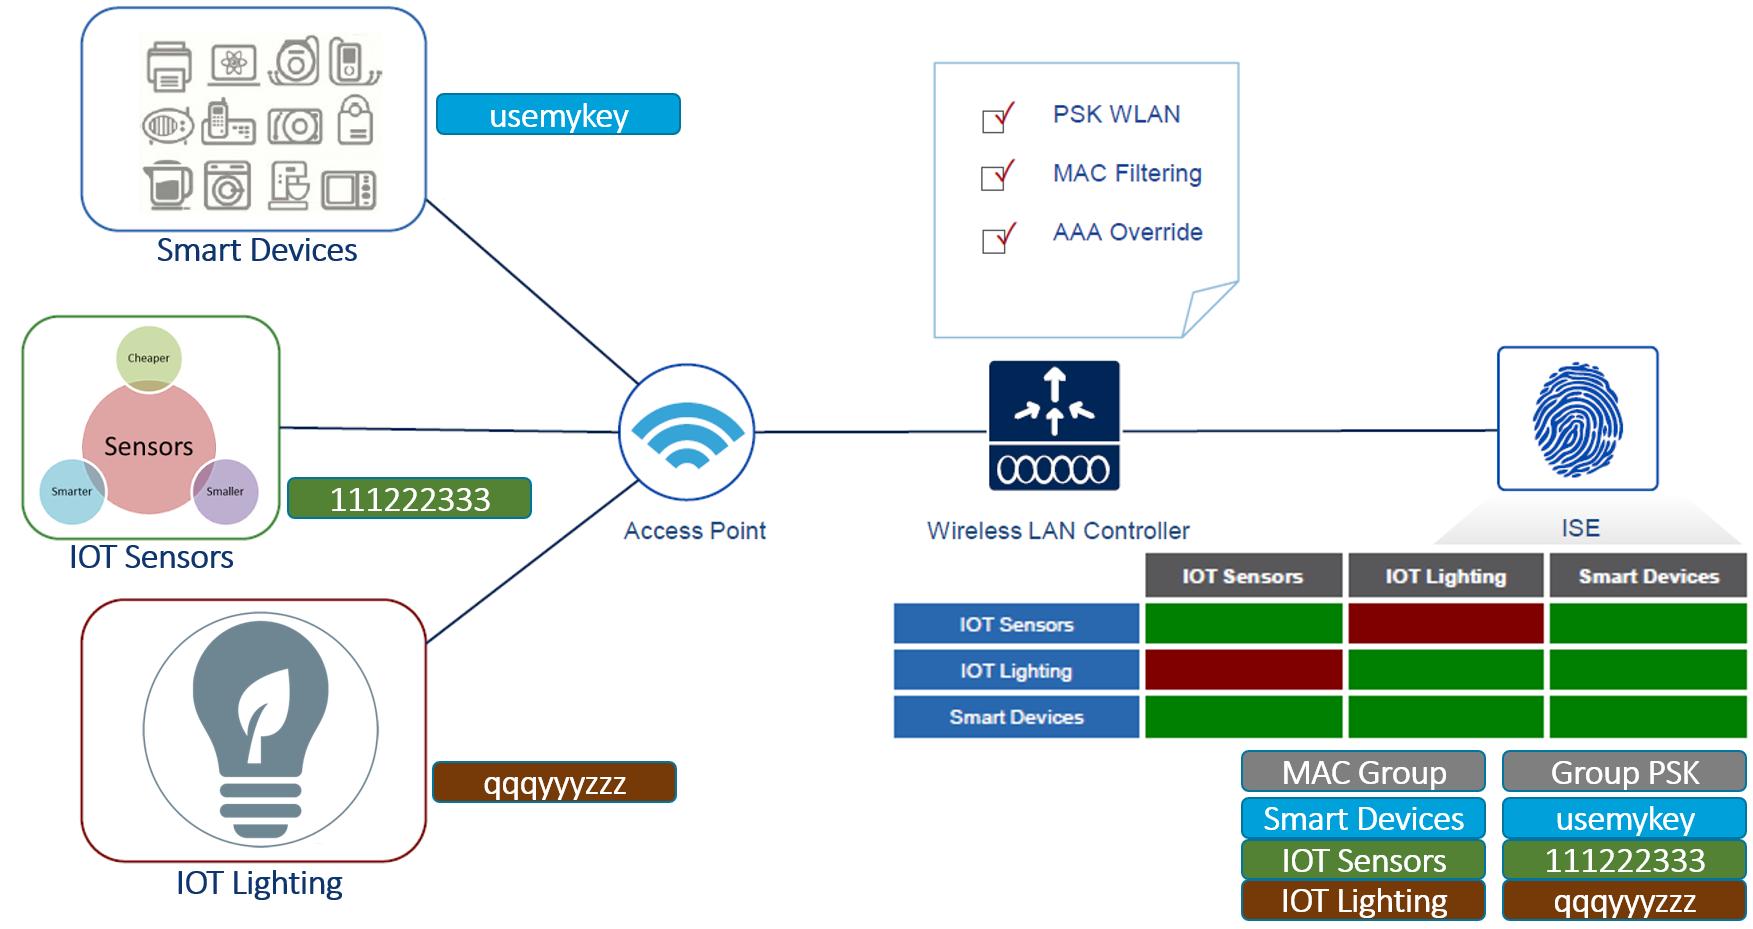 Cisco iPSK, identity Pre-Shared Key